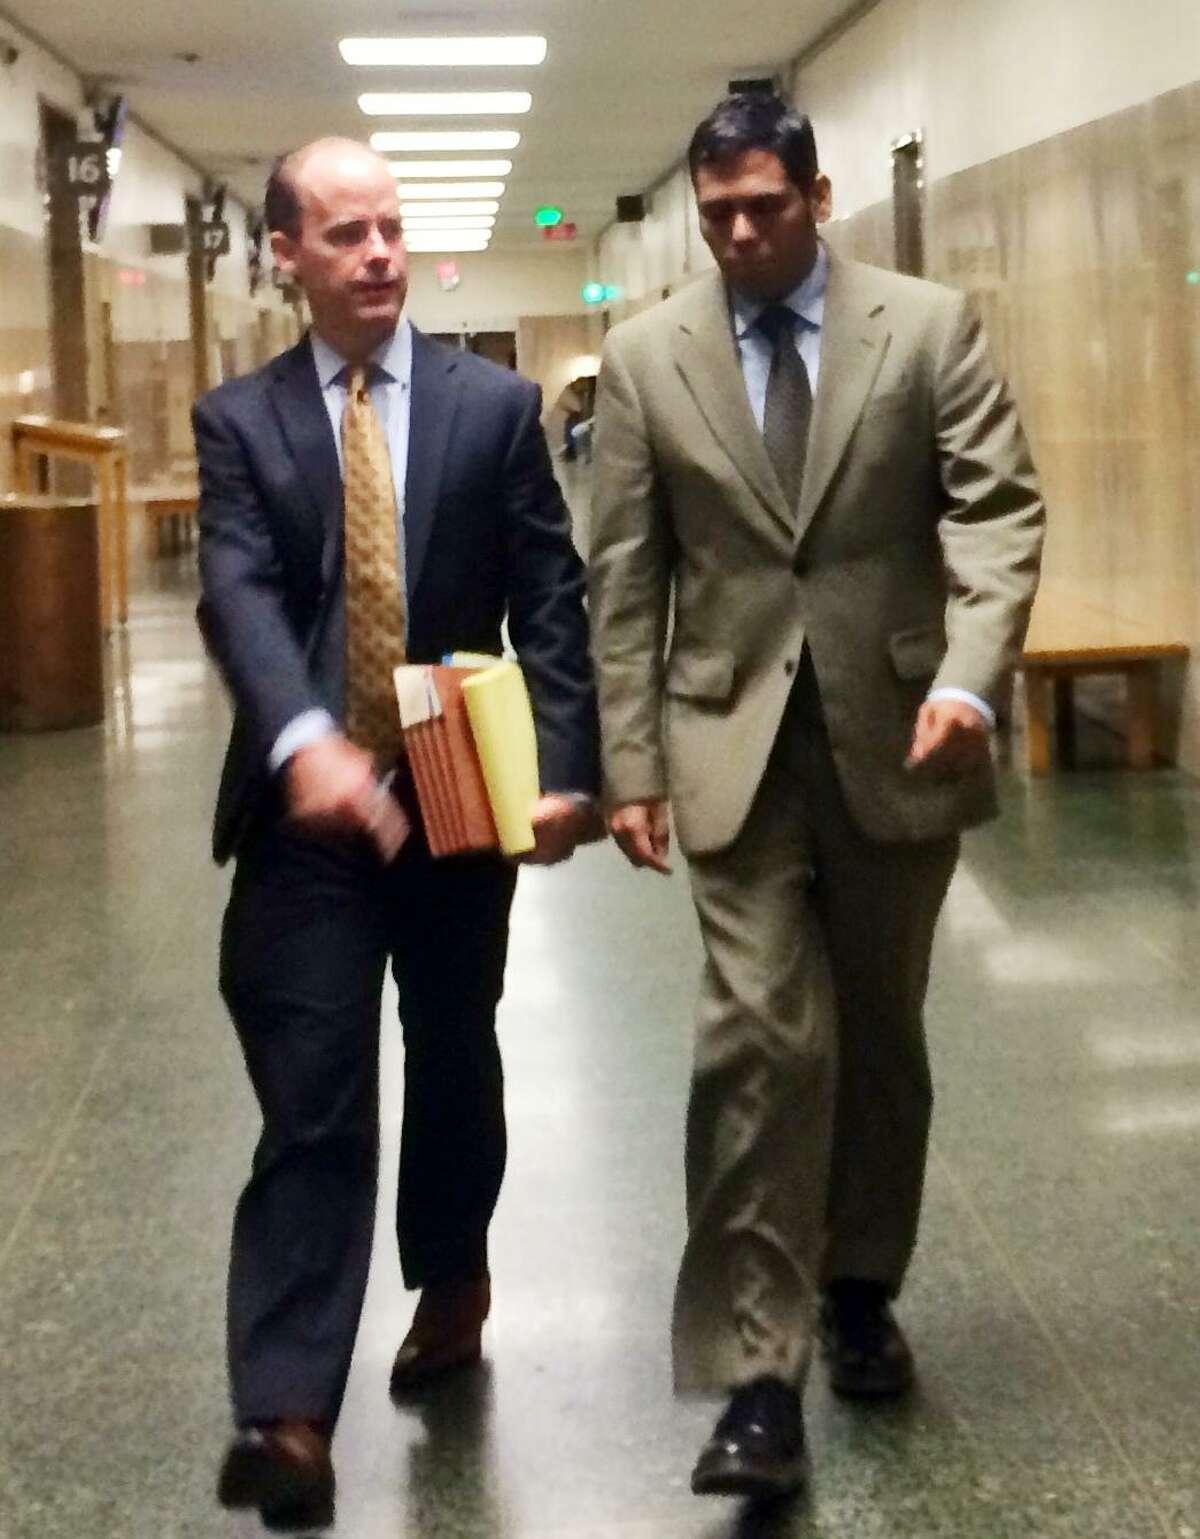 Enrique Pearce walks into court Friday alongside attorney, Sam O'Keefe.